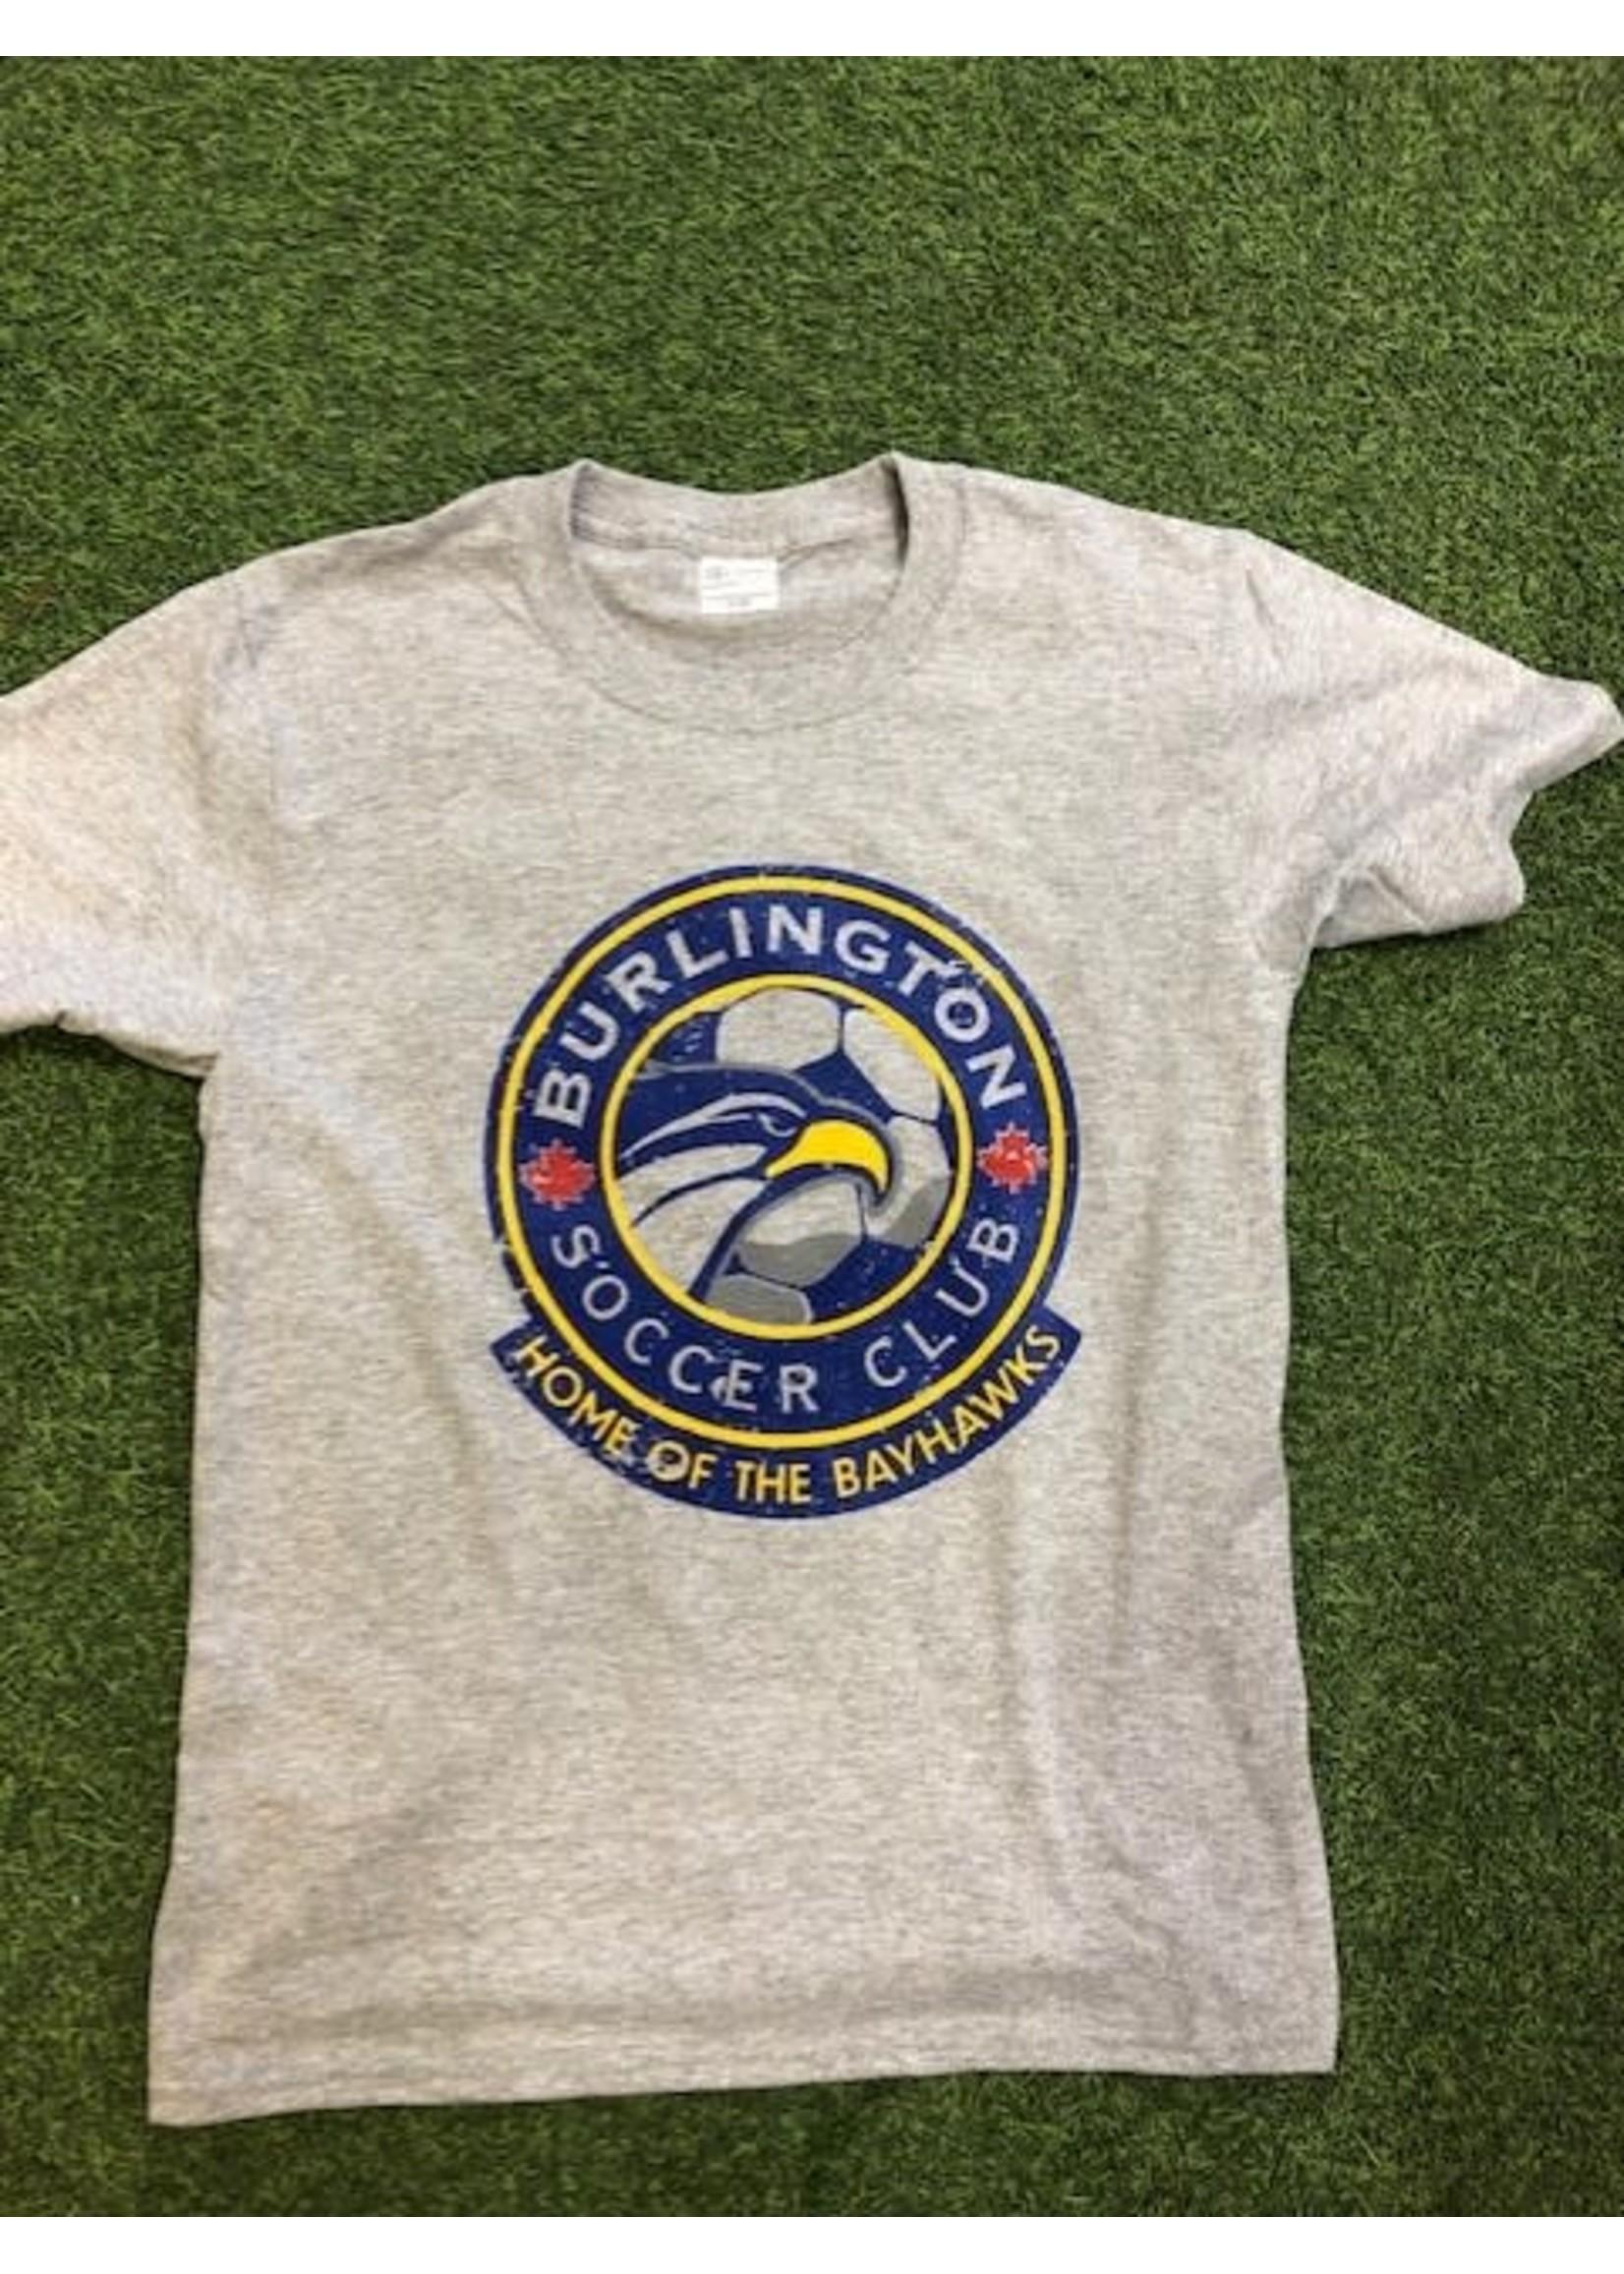 BURLINGTON SOCCER CLUB T SHIRT